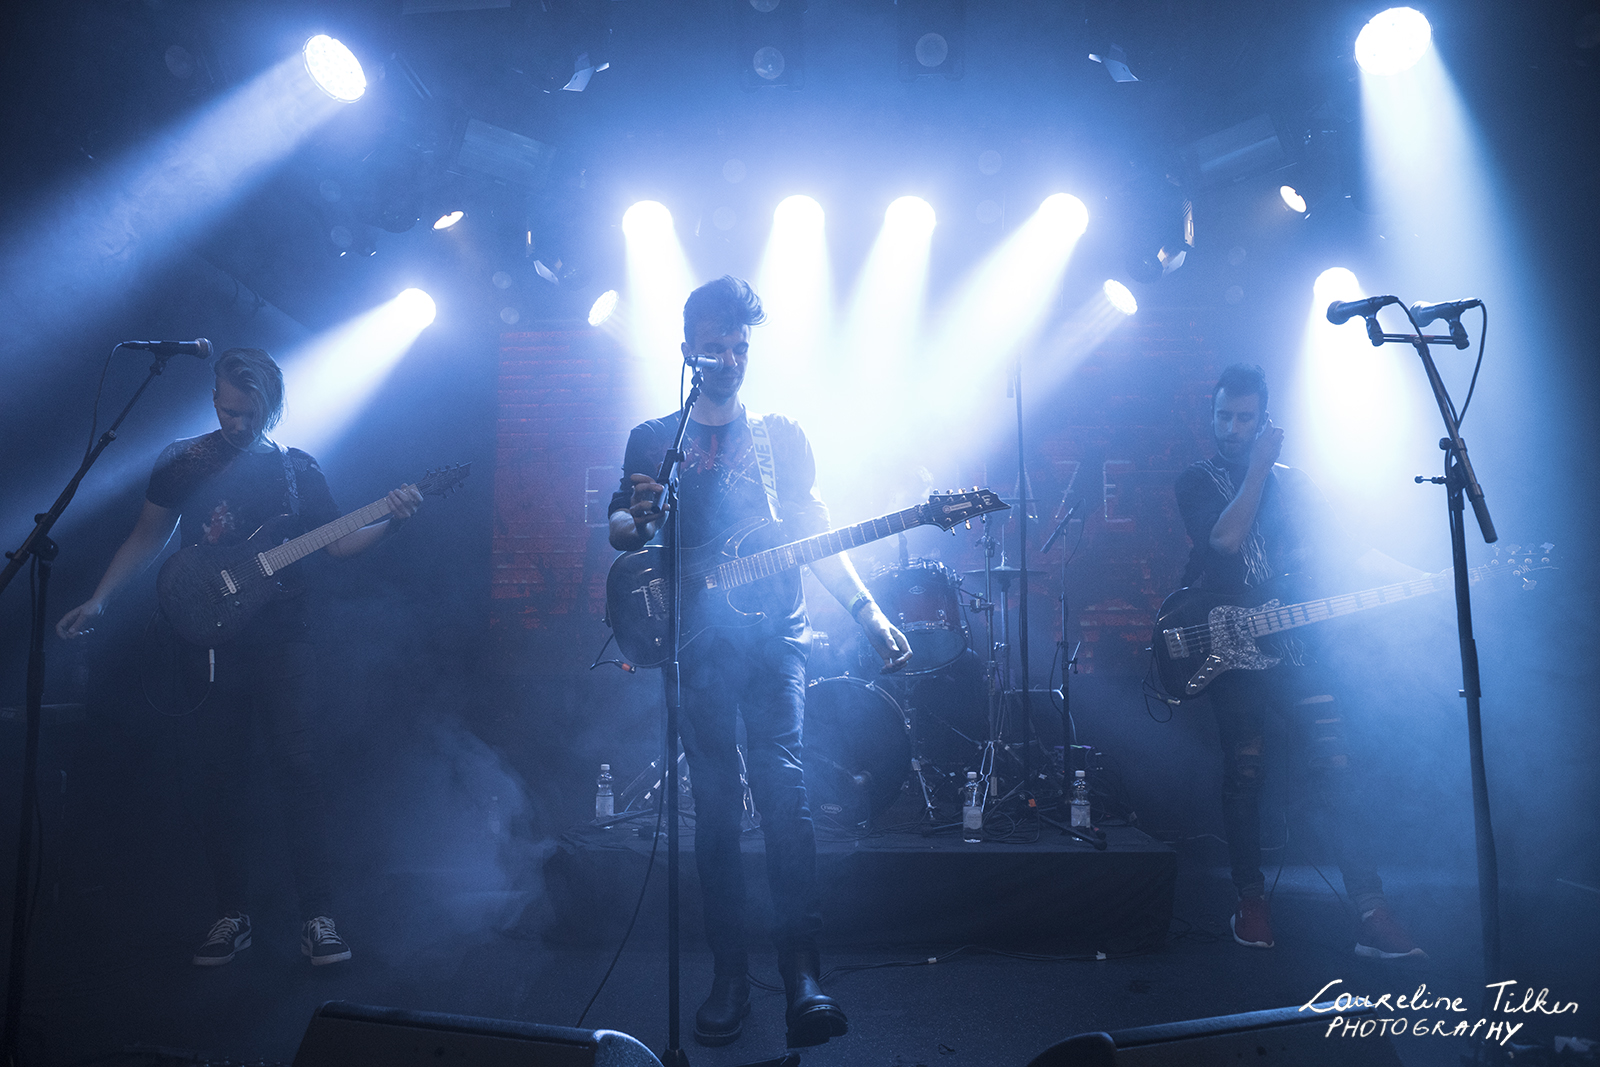 GALLERY: 28.7.2021 Luna Kills, Blame Me!, & Edge of Haze @ On The Rocks, Helsinki